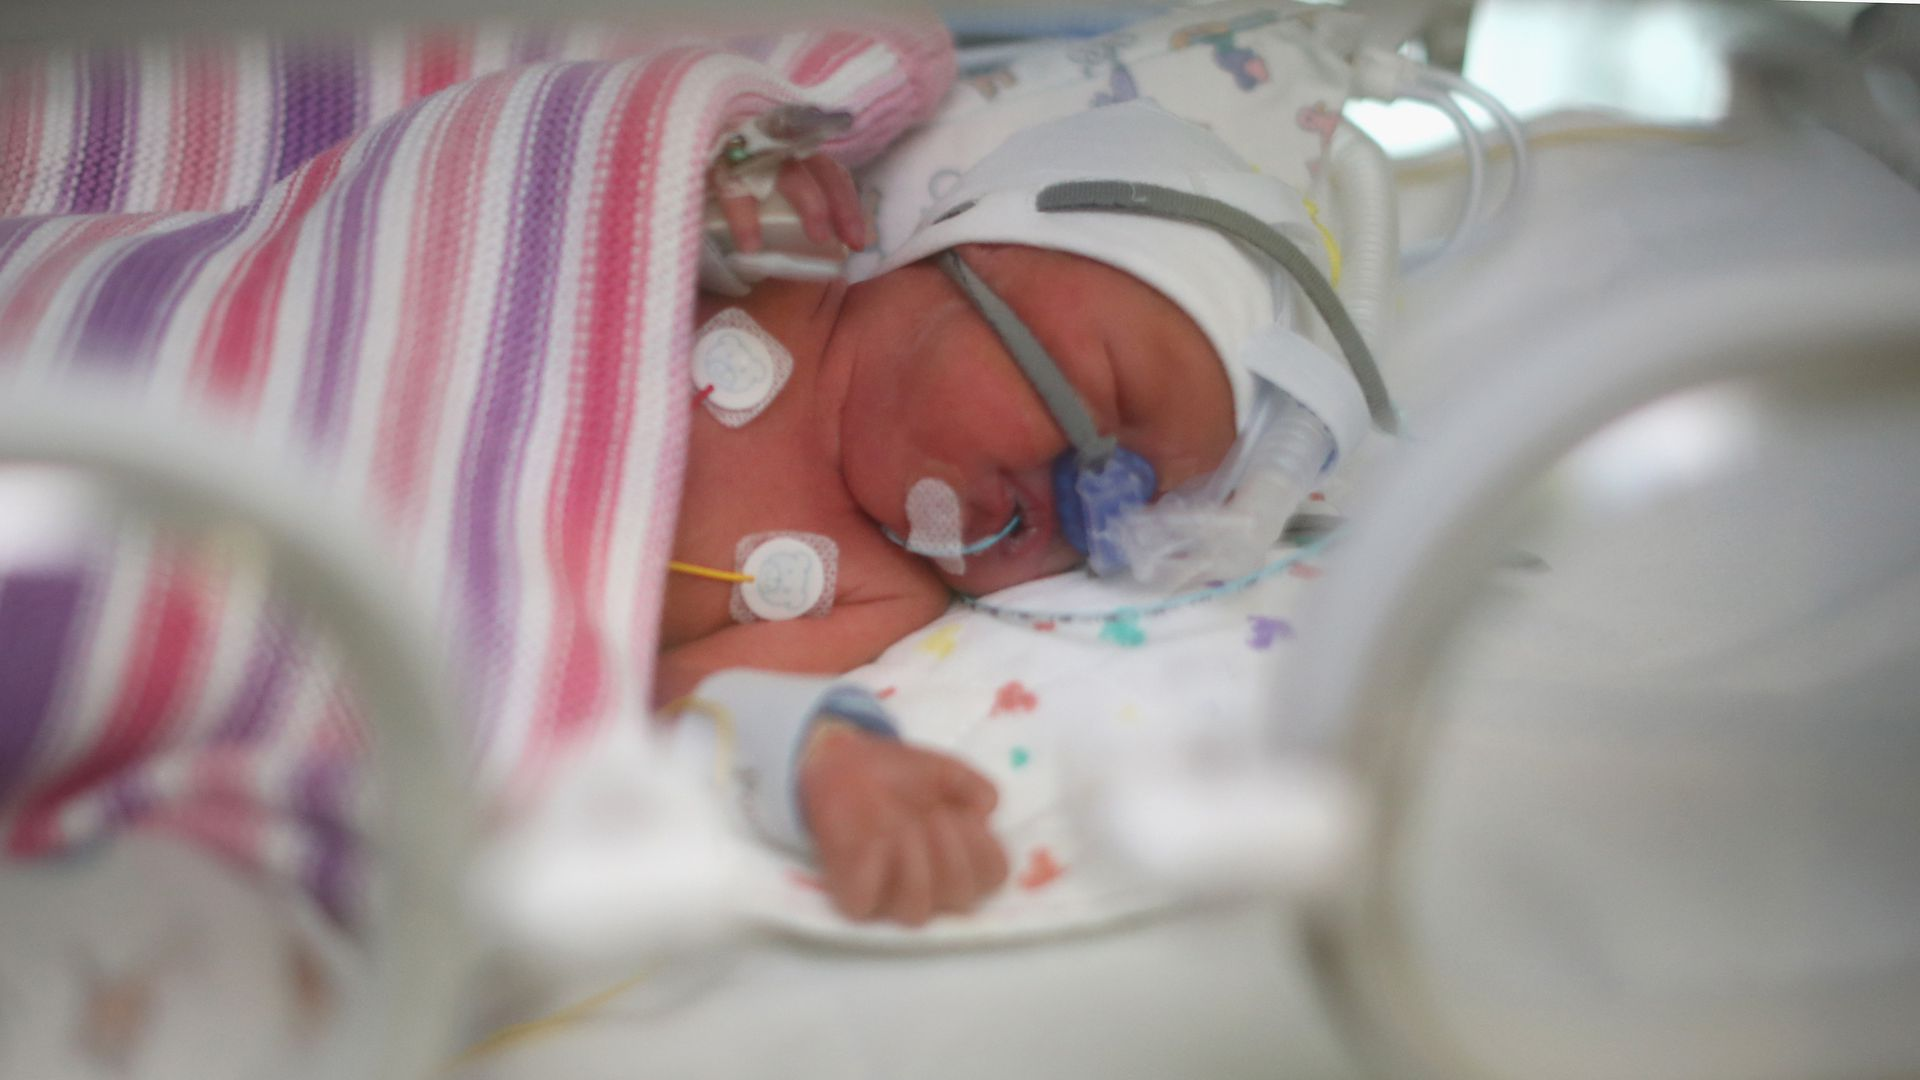 A baby in a hospital in Birmingham, England.